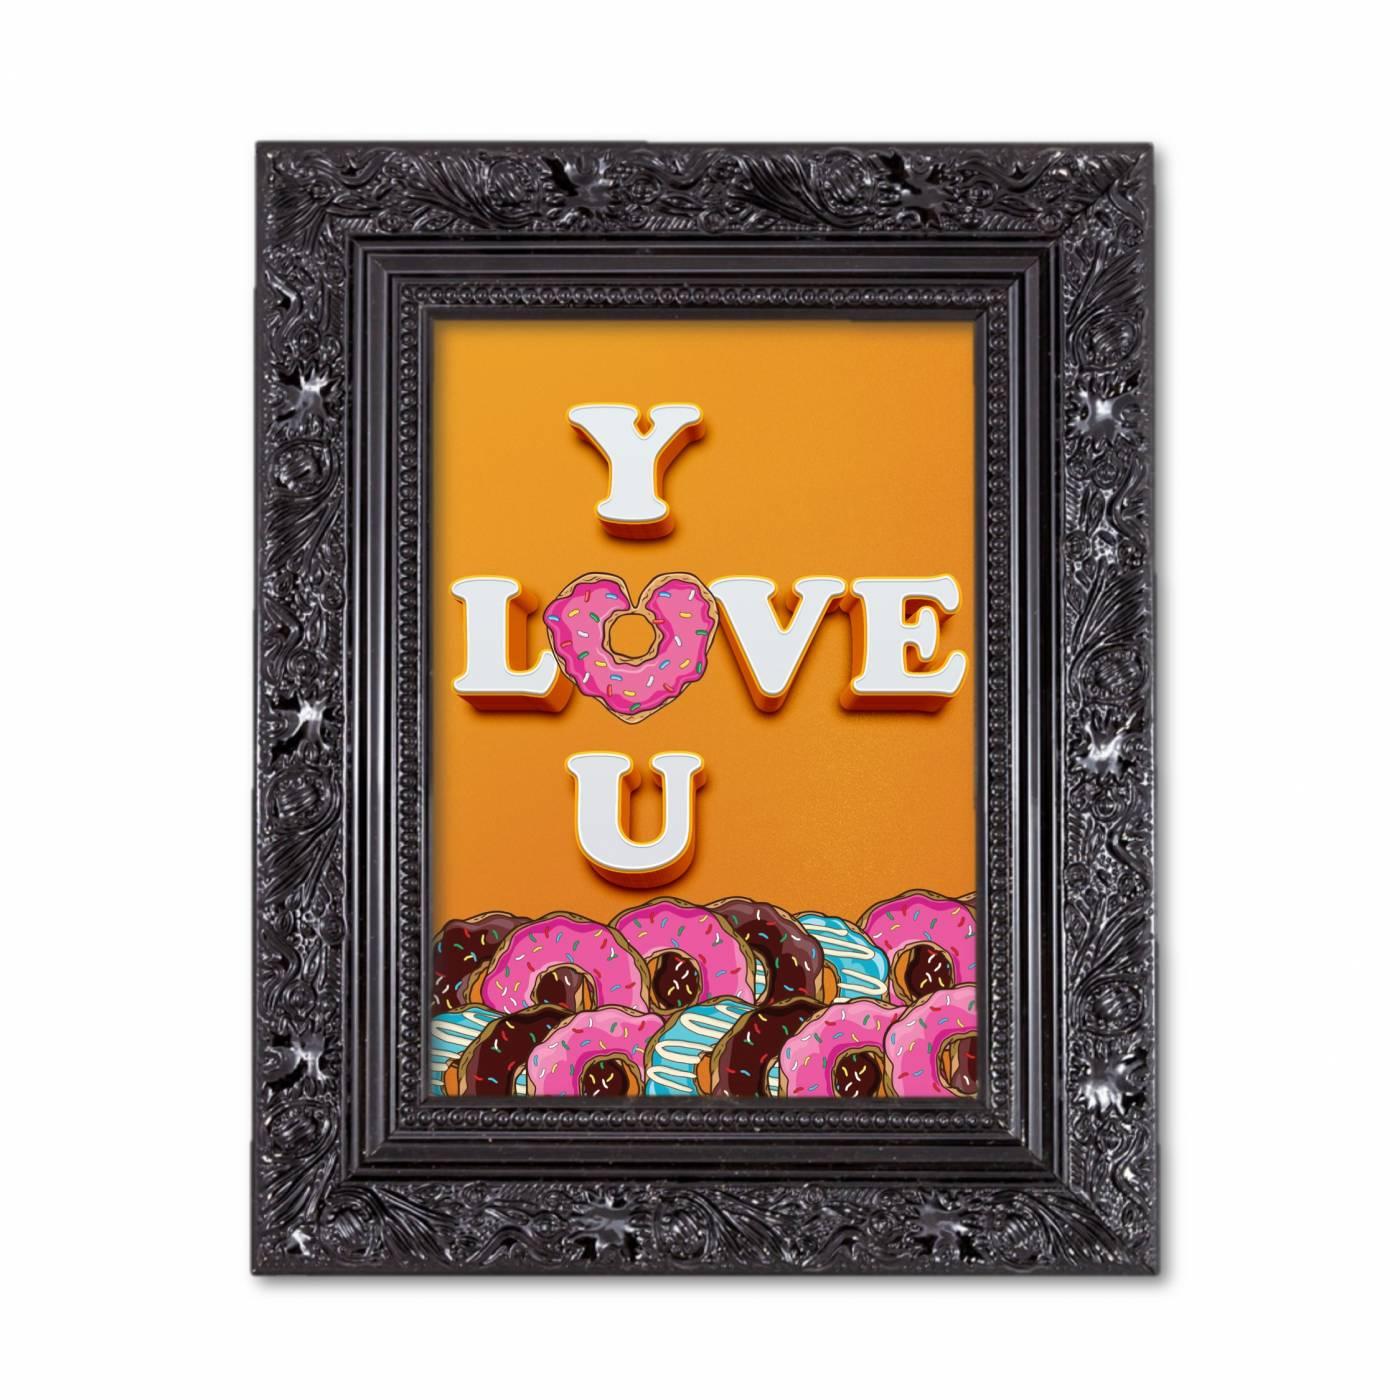 Love dunets